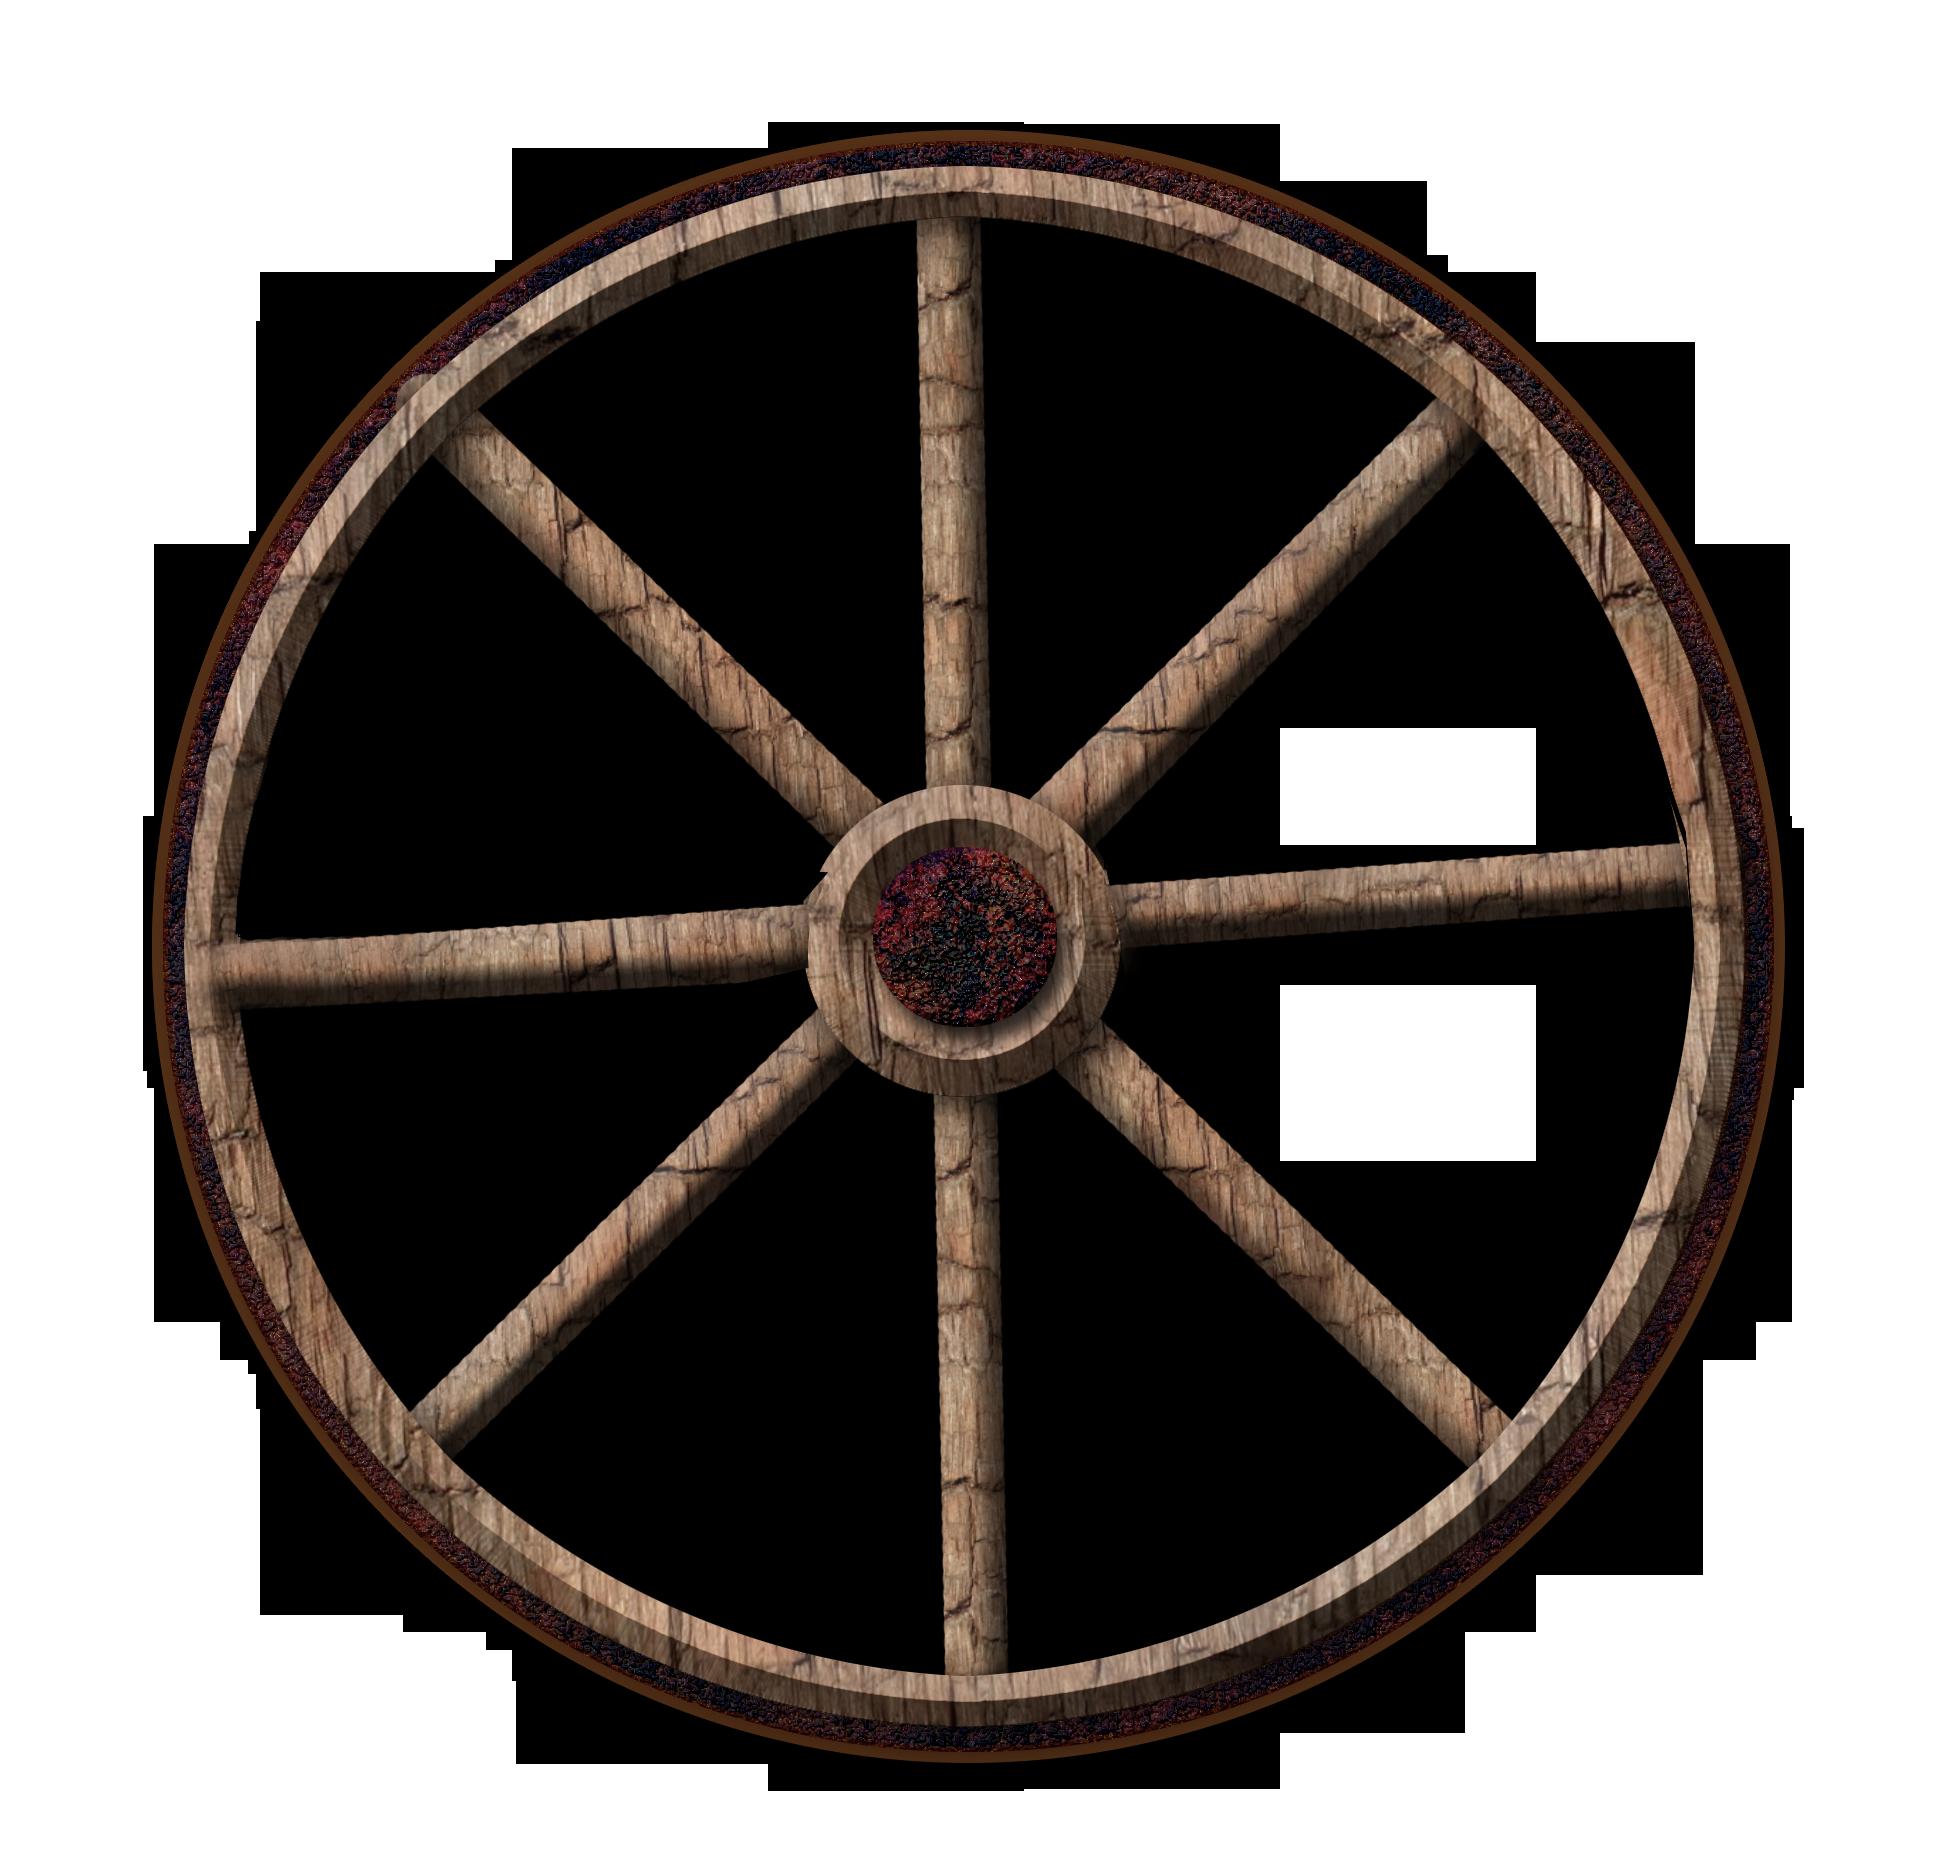 Wagon Wheel Clip Art N24 free image.